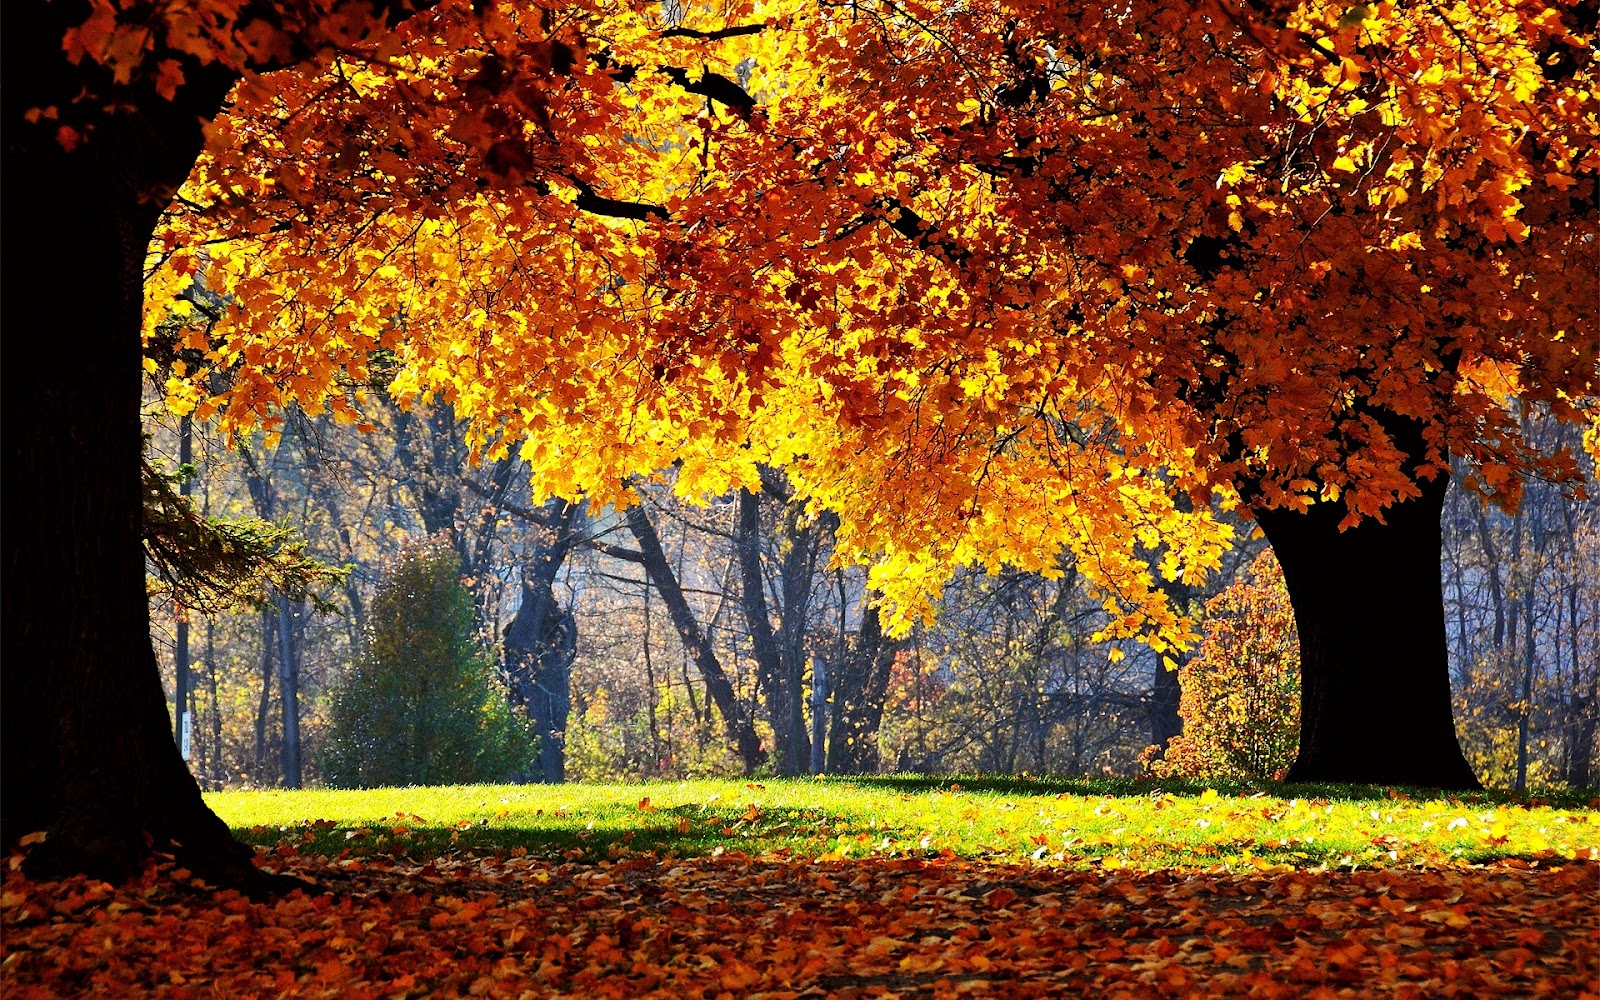 http://1.bp.blogspot.com/-7ngiHByu3mc/T-tAor9Rq2I/AAAAAAAAAWk/aMo4hSmcduw/s1600/park-tree-autumn-leaf-forest-nature.jpg